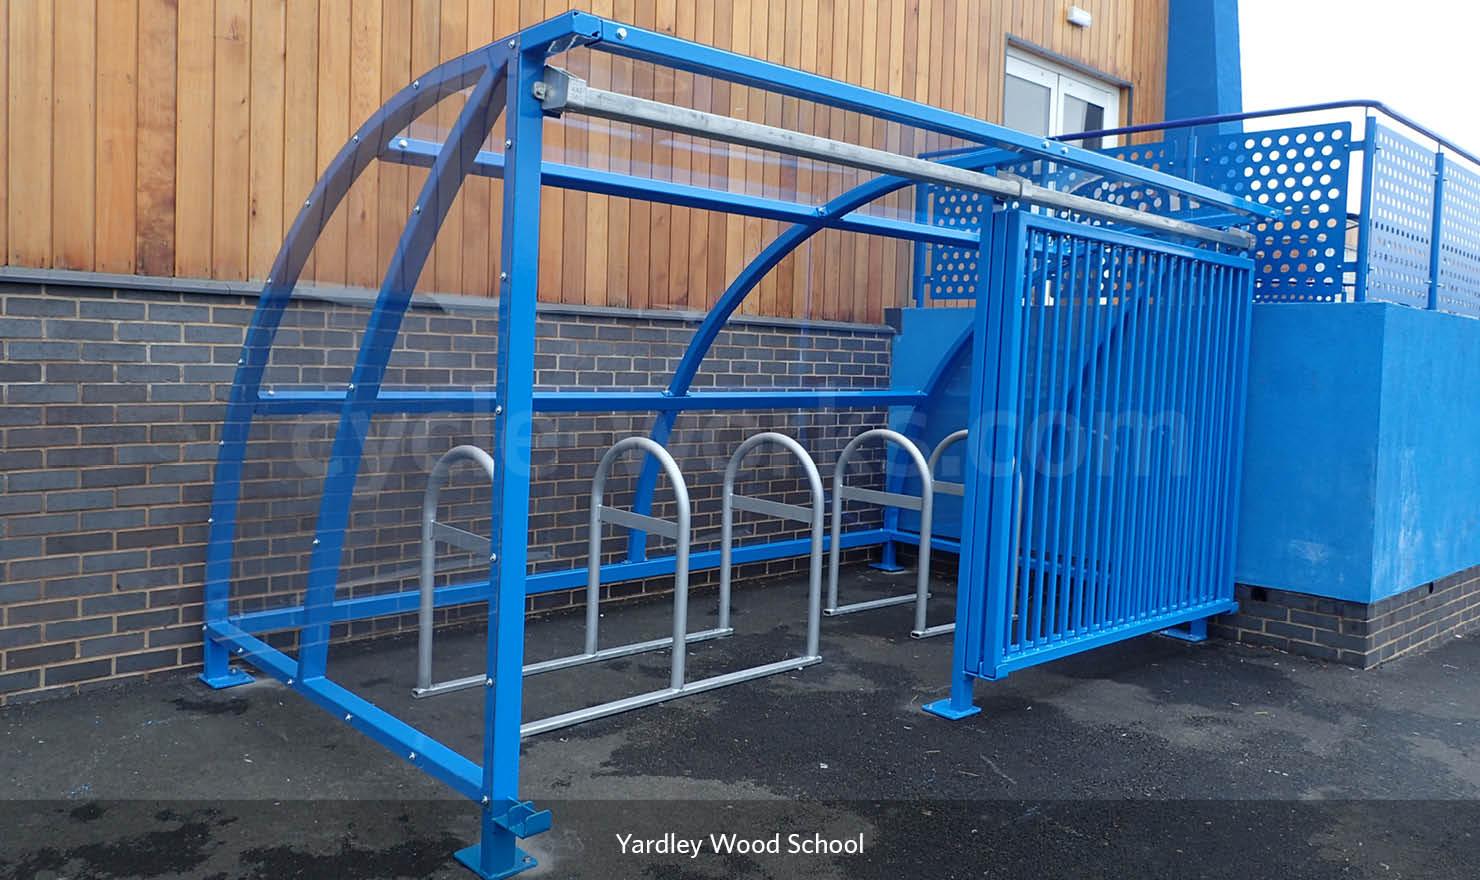 Solent Bike Shelter Installed at Yardley Wood Primary School